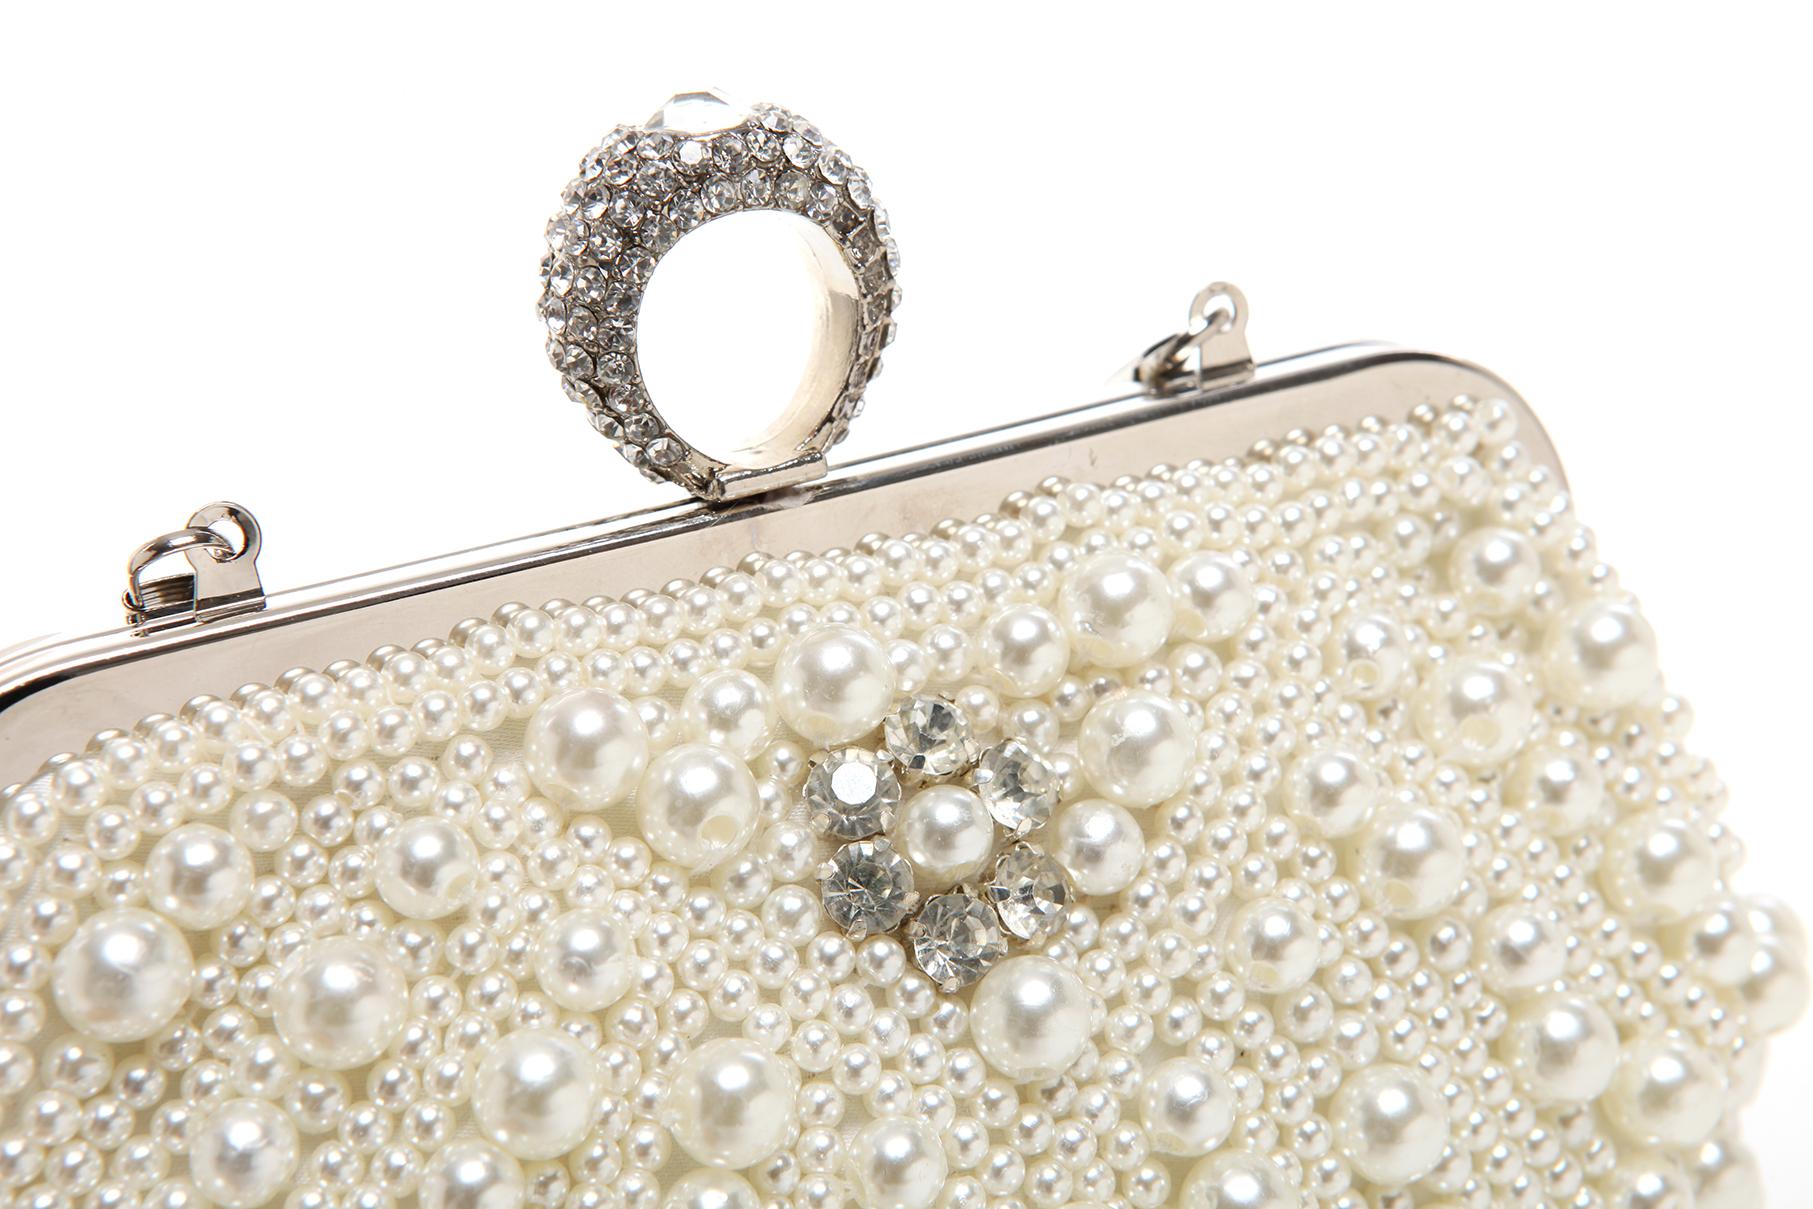 TIANA White Pearl Rhinestone Evening Bag clasp Closeup